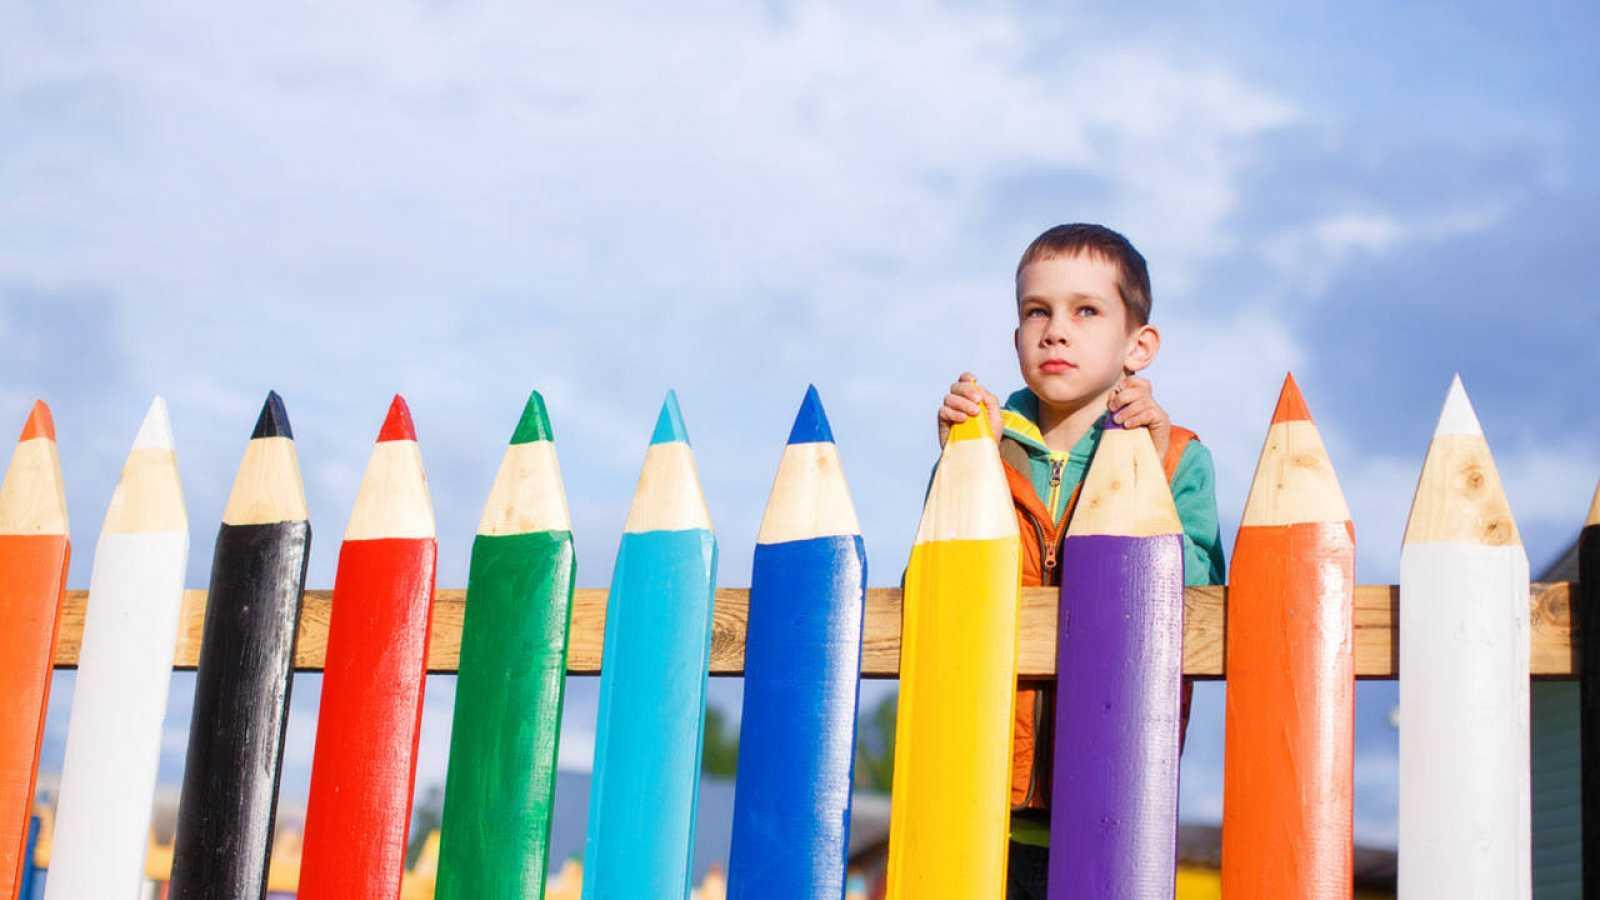 Un niño se asoma a la valla de un parque infantil